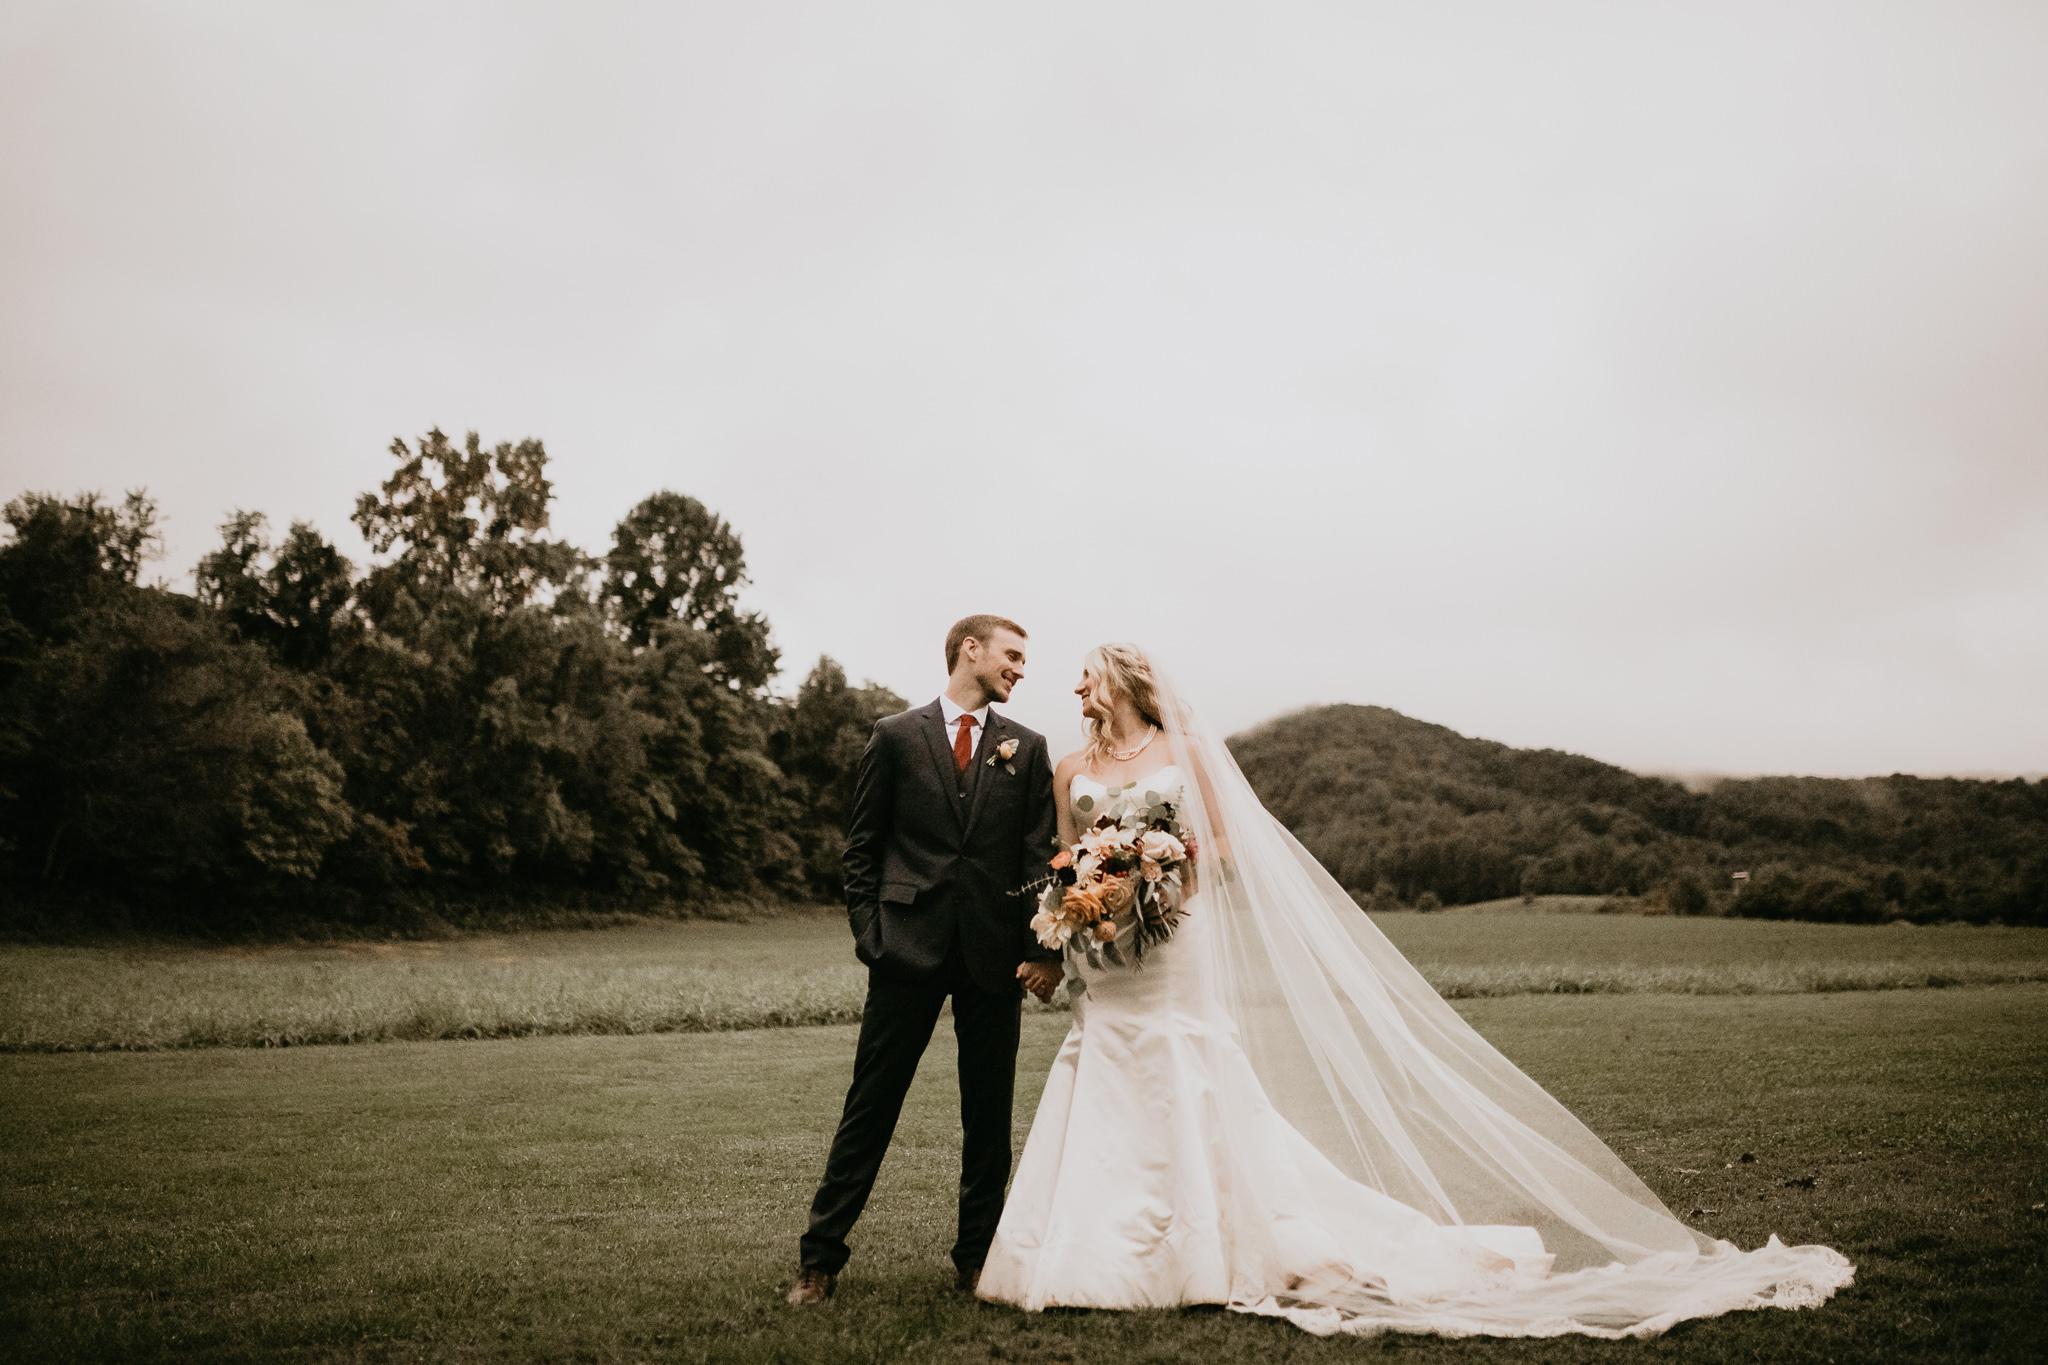 Sundara - Weddings - Virginia - Best Wedding Photographer - Pat Cori Photography-79.jpg